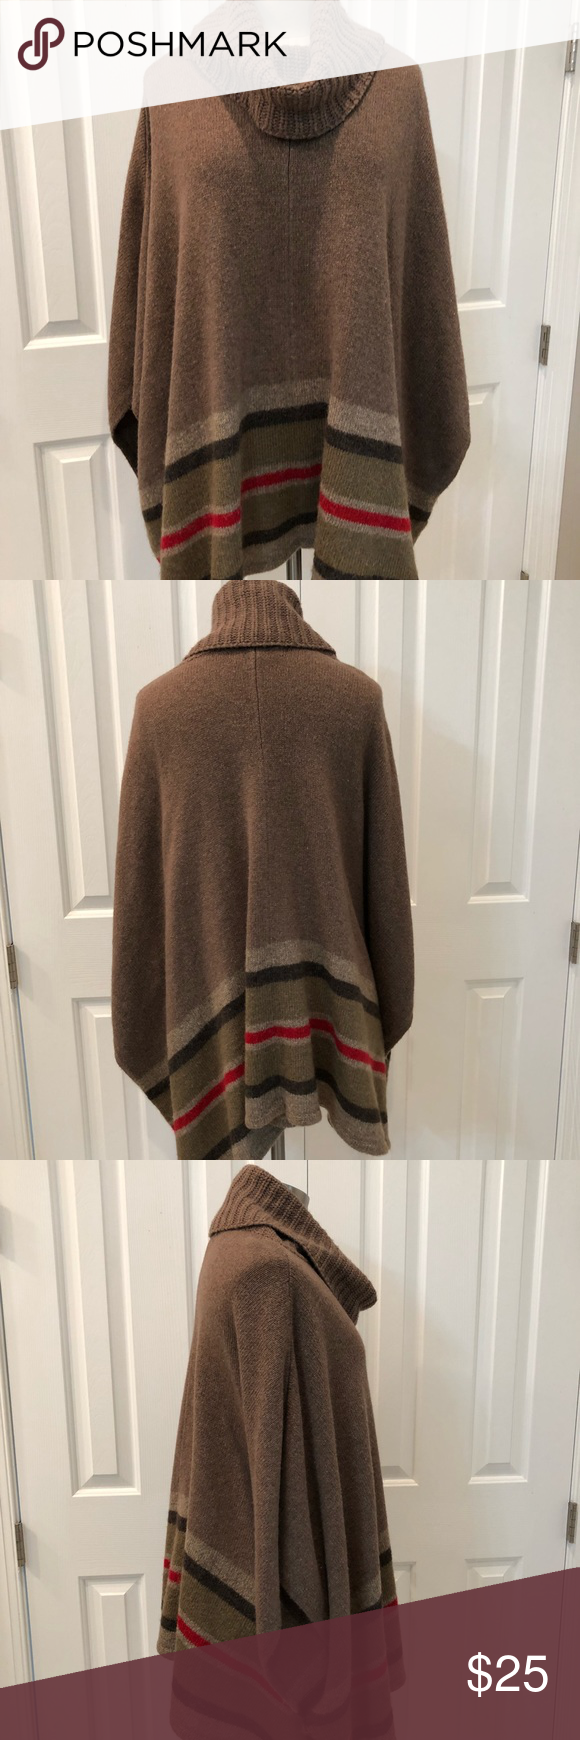 Trendy Fall Loft Sweater Cape | Sweater cape, Lofts and Cape